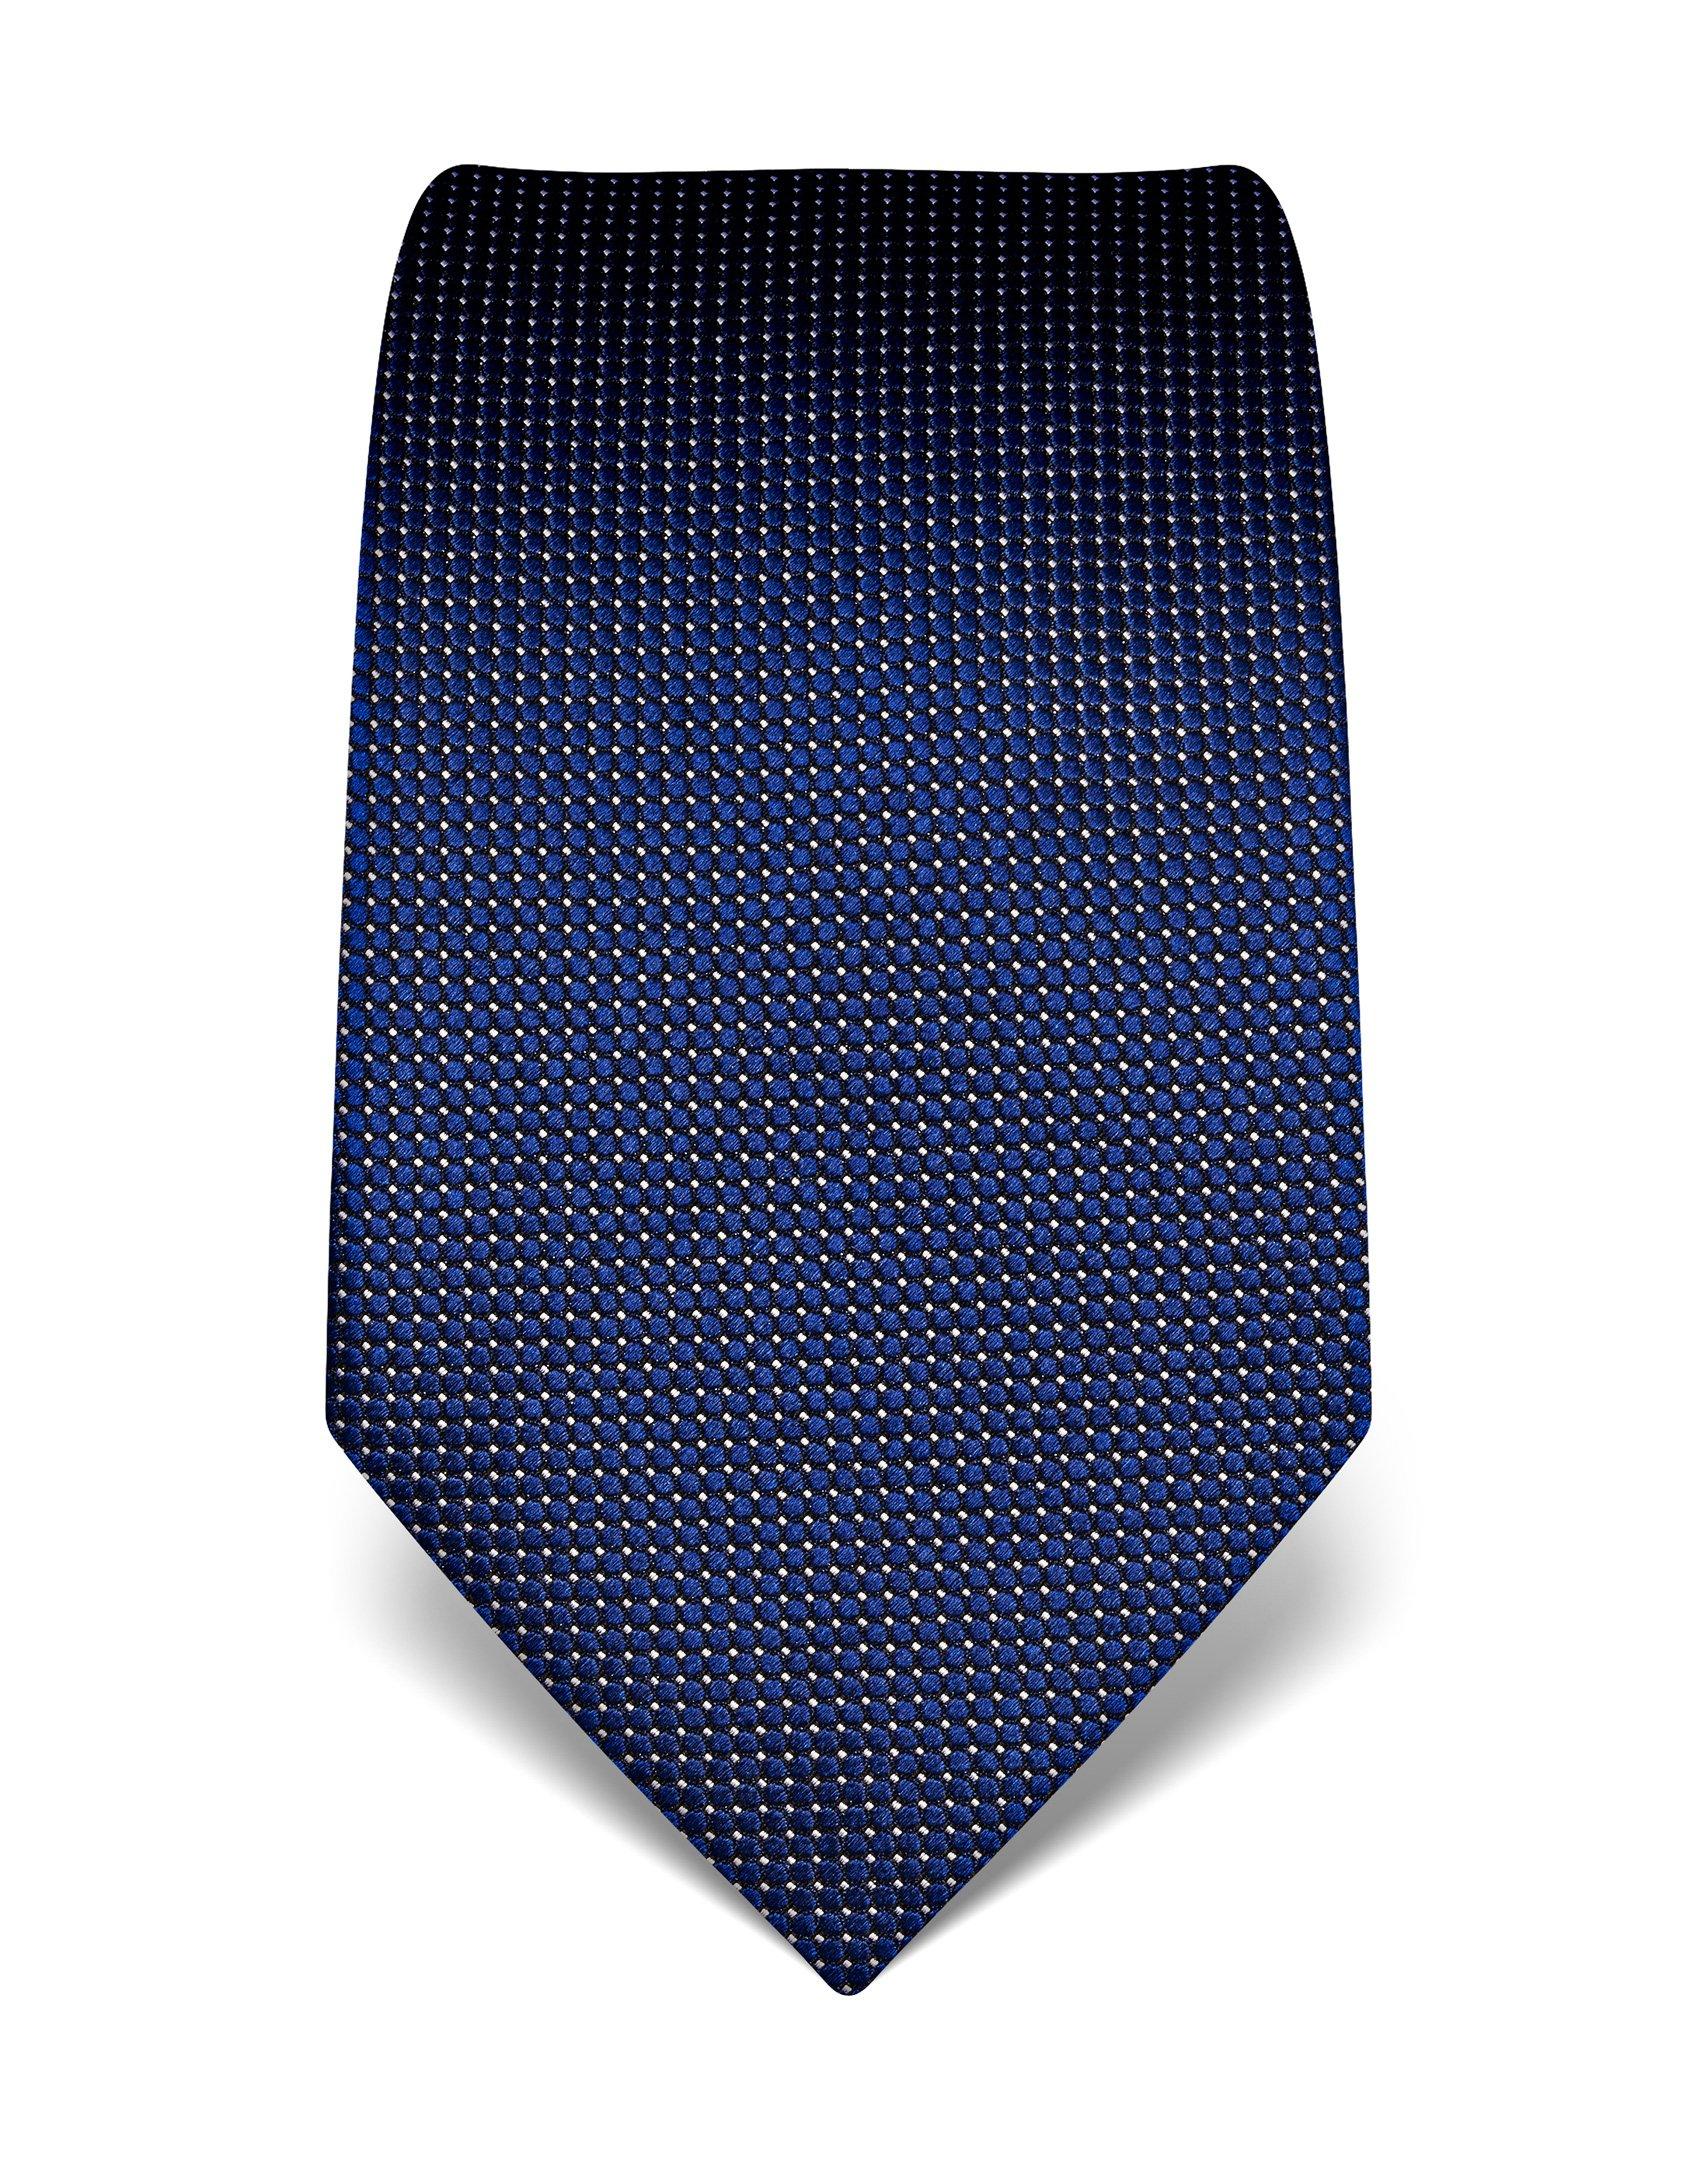 Vincenzo Boretti Men's silk tie polka dot pattern dark blue